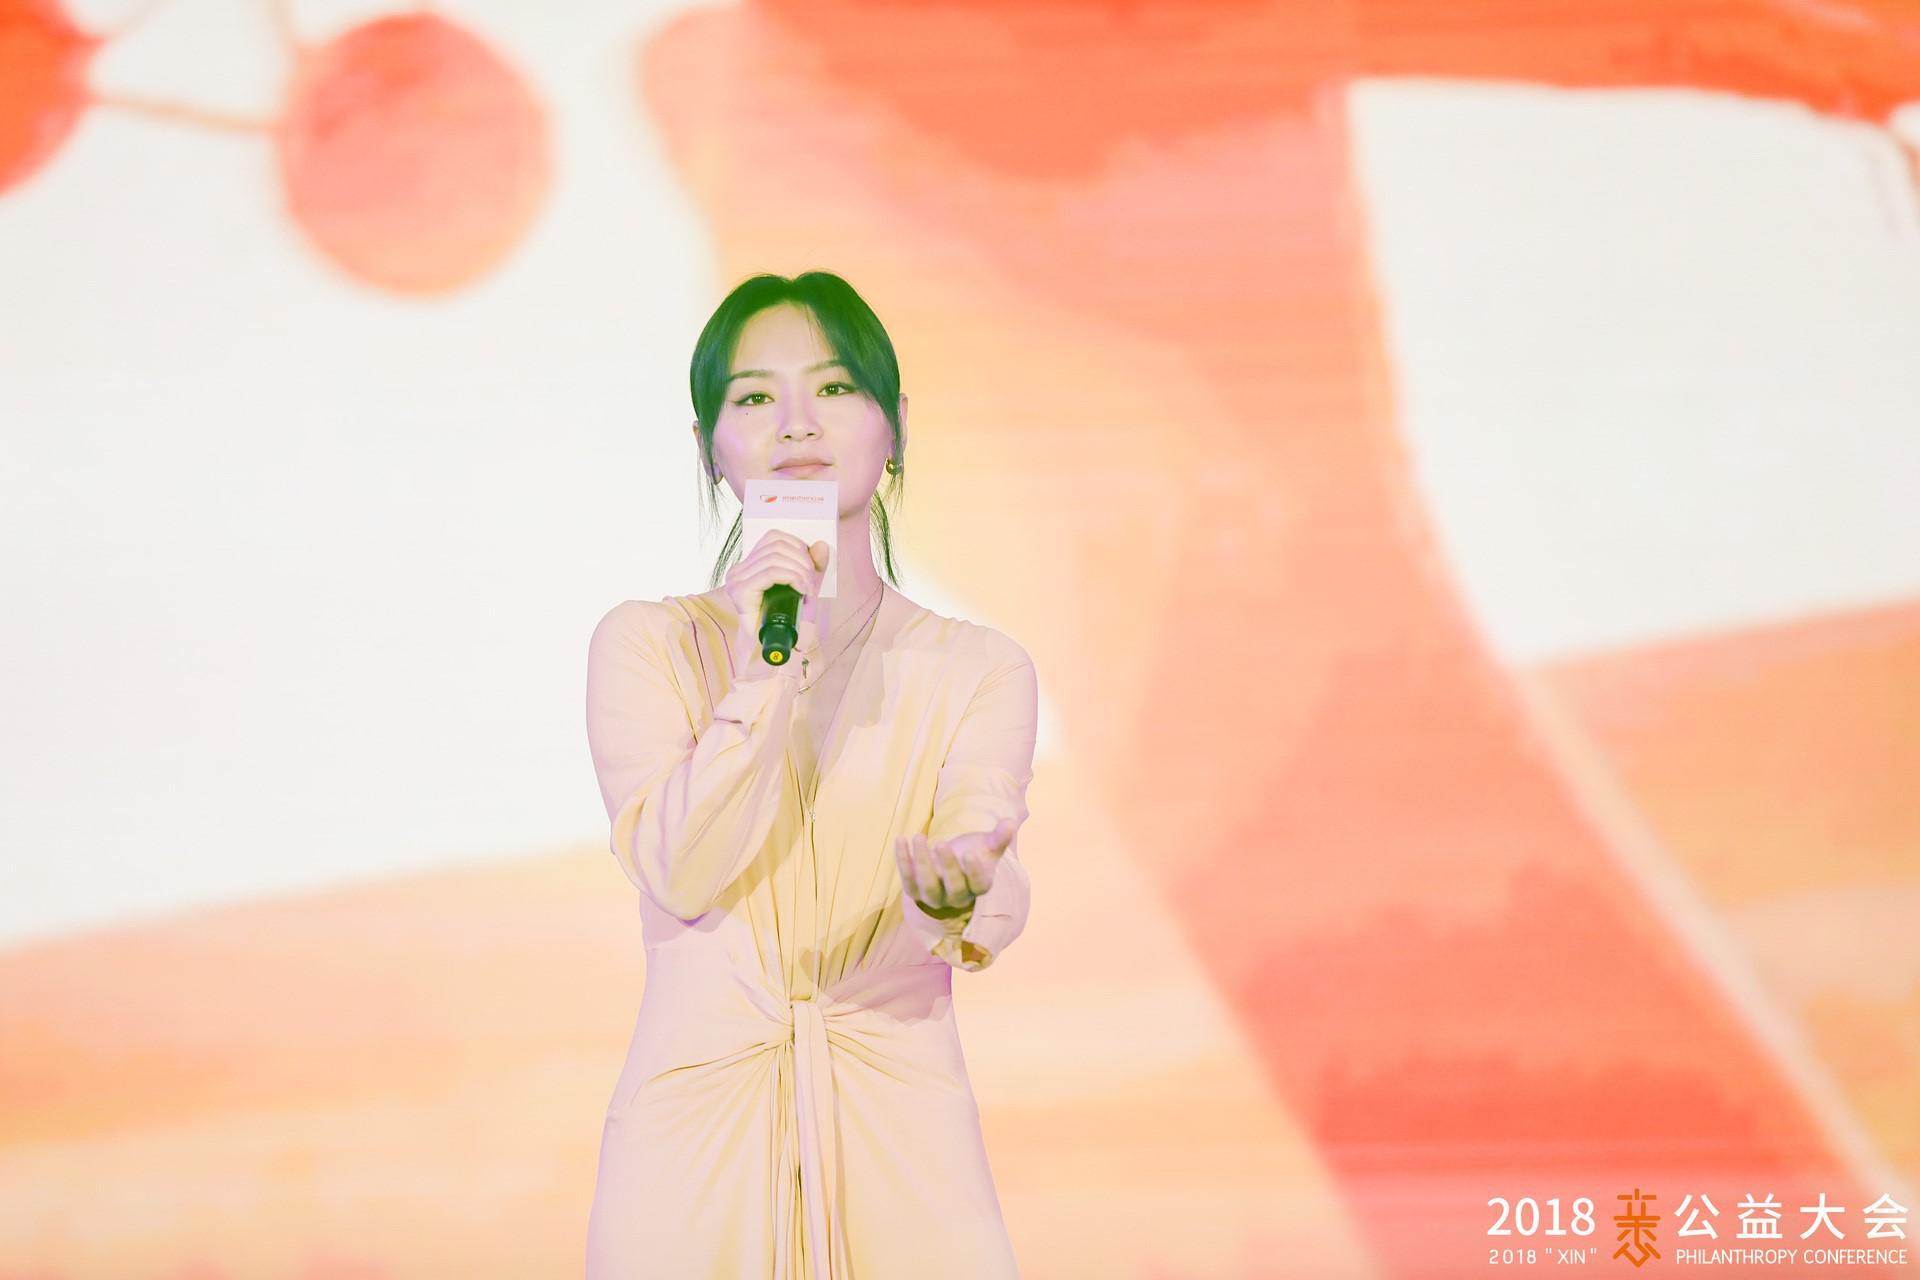 2018 XIN公益大会 约旦王后与马云同台演讲